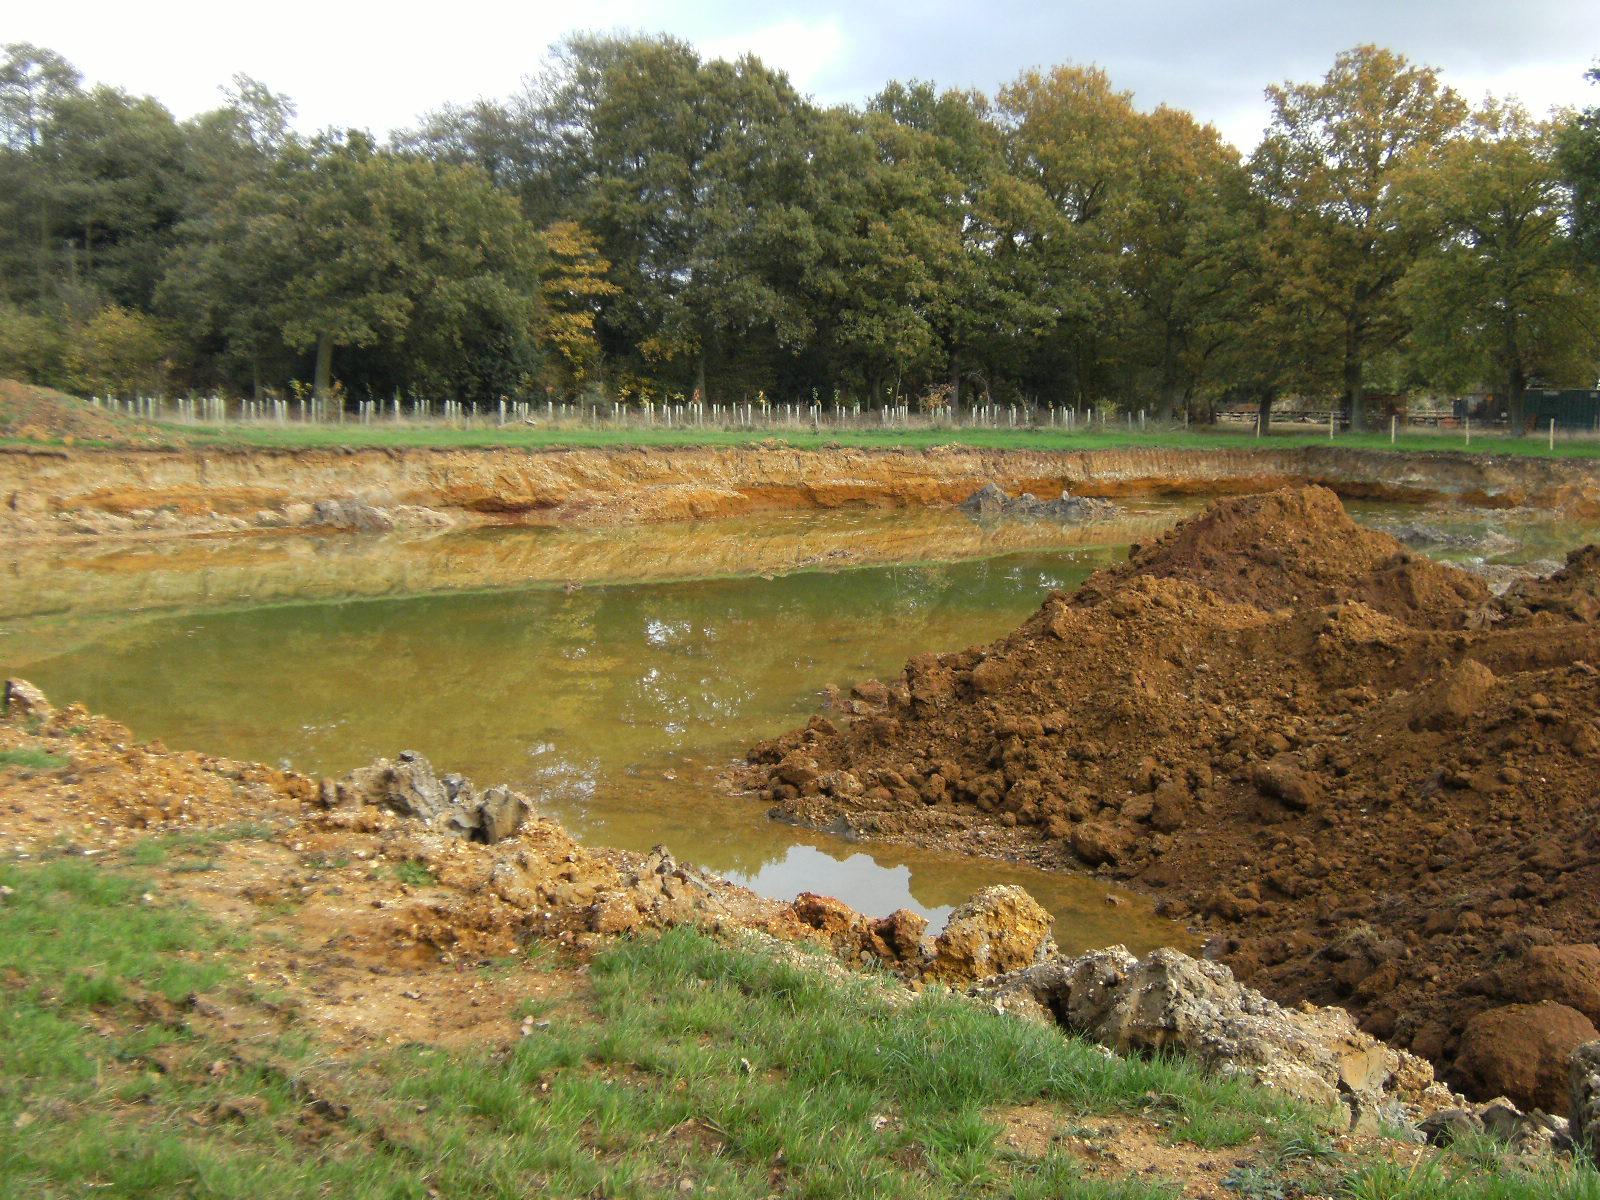 DSCF2282 Sand & gravel workings in Blackwater Valley